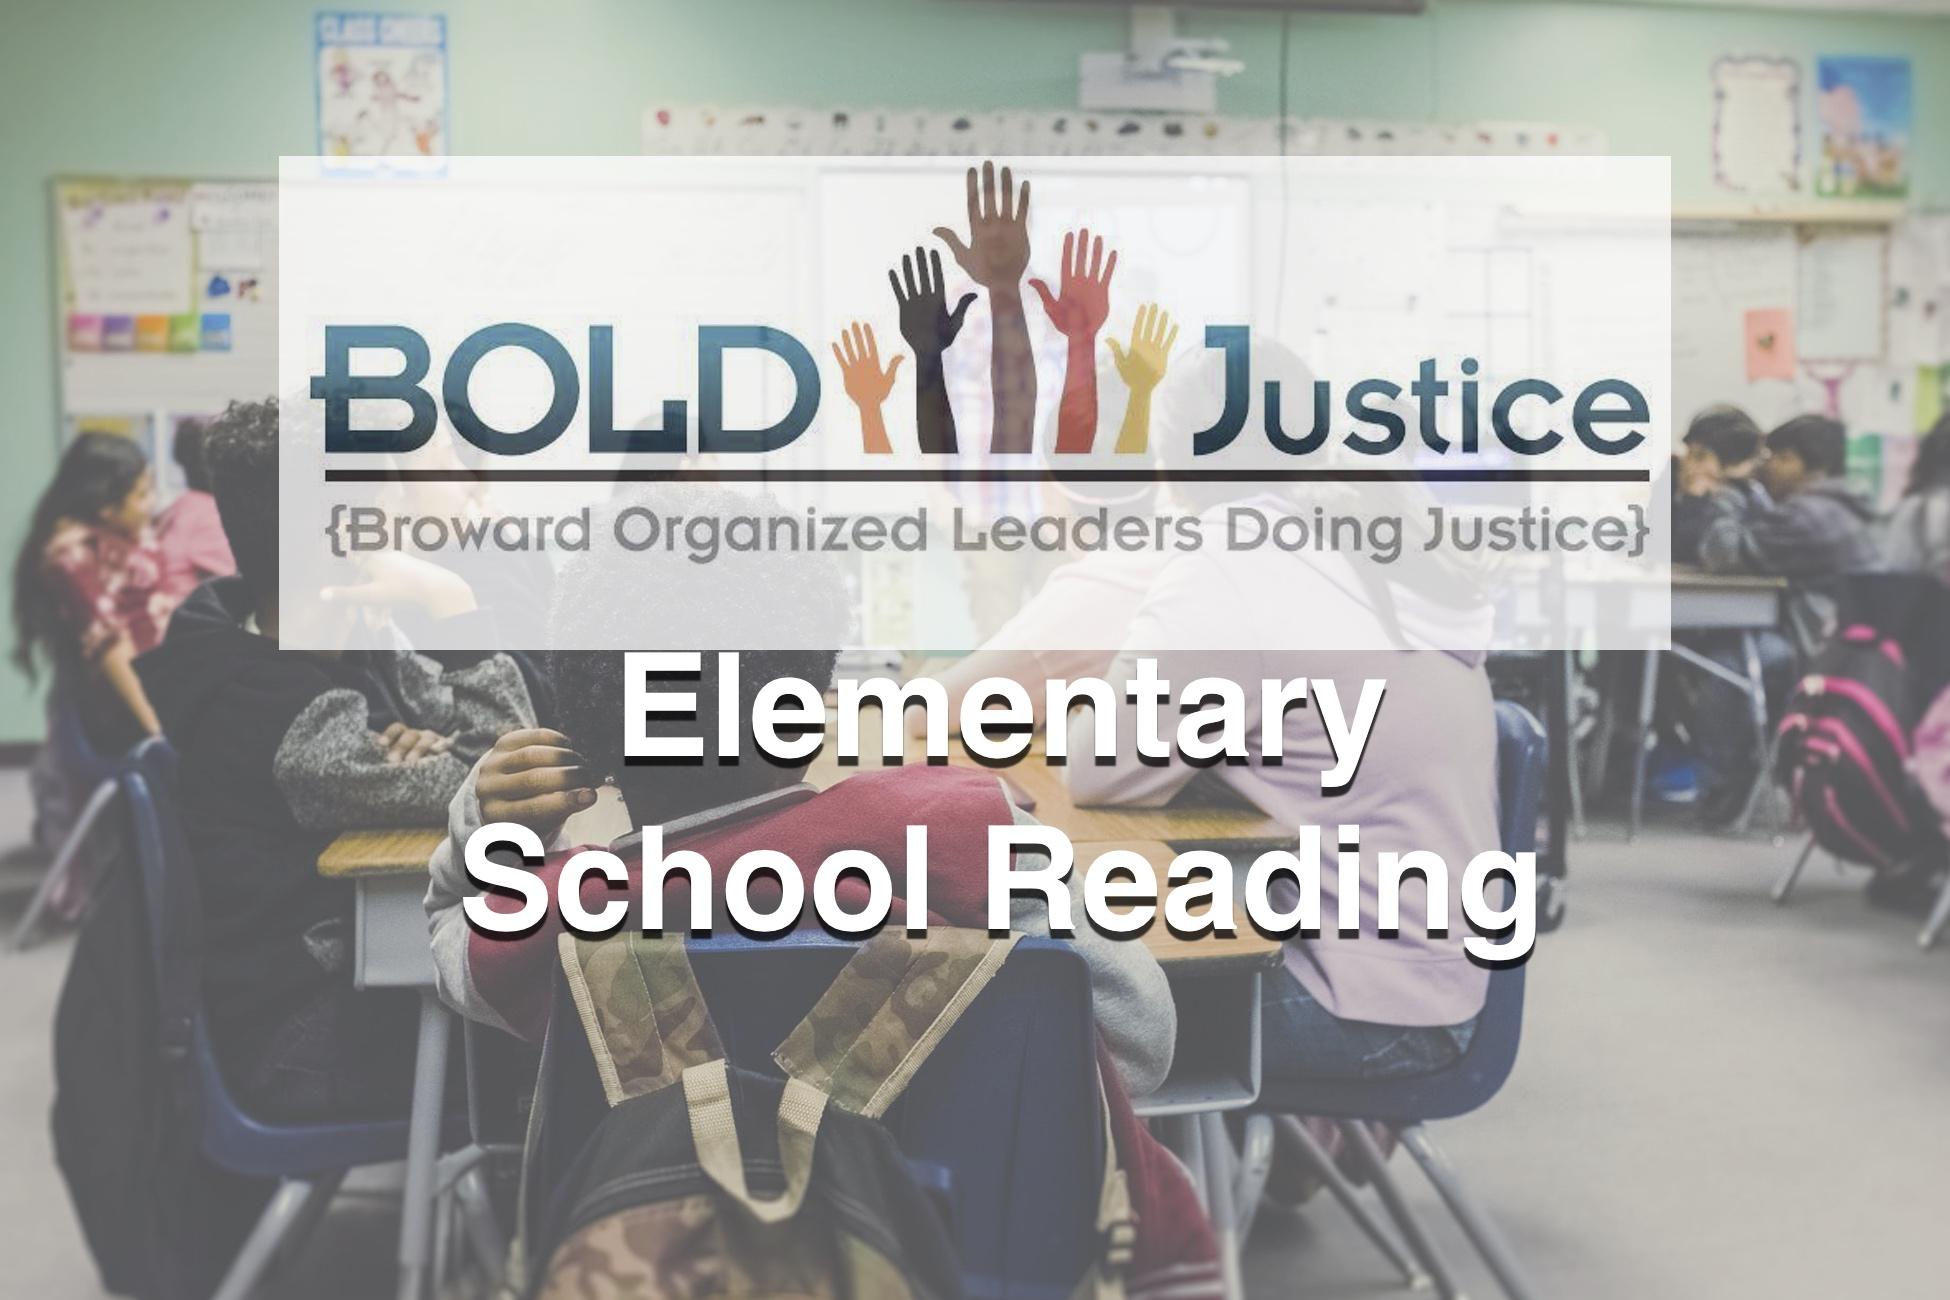 Elementary School Reading